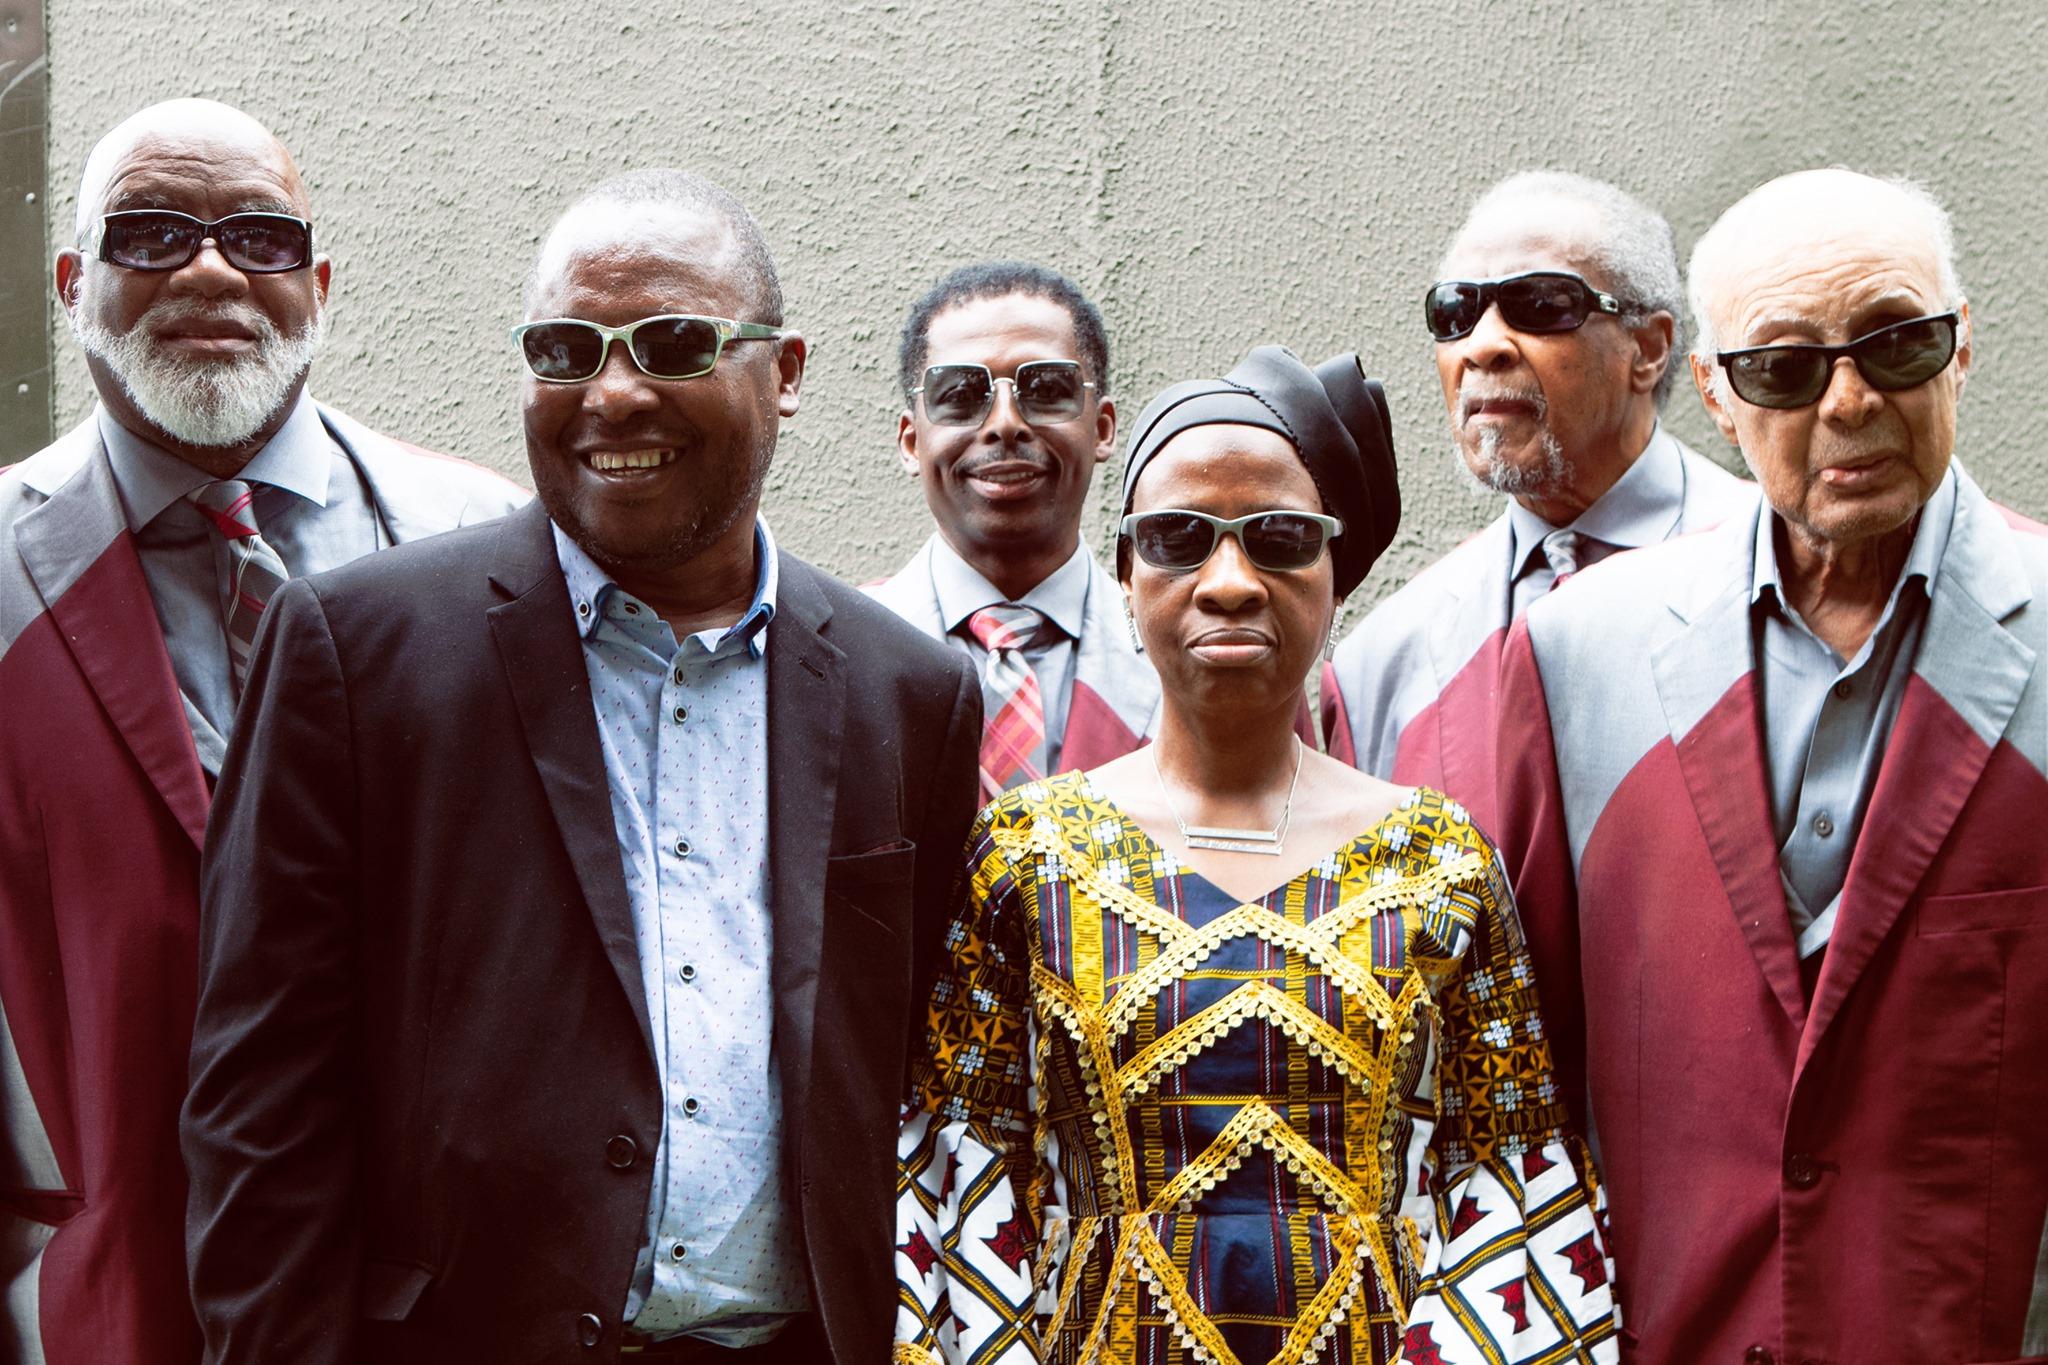 KONSERT: Amadou & Mariam och Blind Boys of Alabama - STOCKHOLM